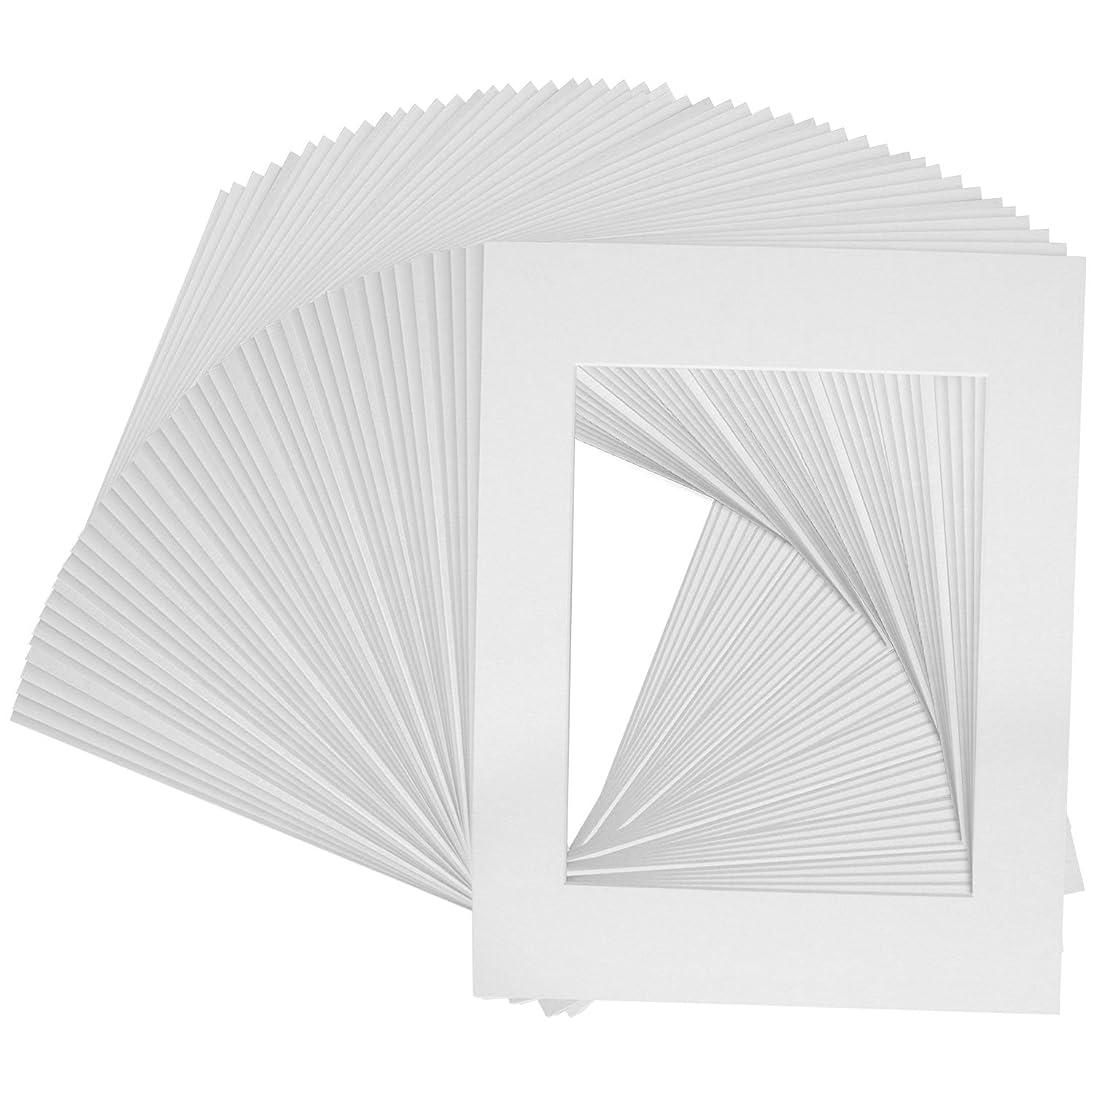 US Art Supply Art Mats Brand Premier Acid-Free Pre-Cut 11x14 White Picture Mat Matte Face Frames. Includes a Pack of 50 White Core Bevel Cut Matte Frames for 8x10 Photos